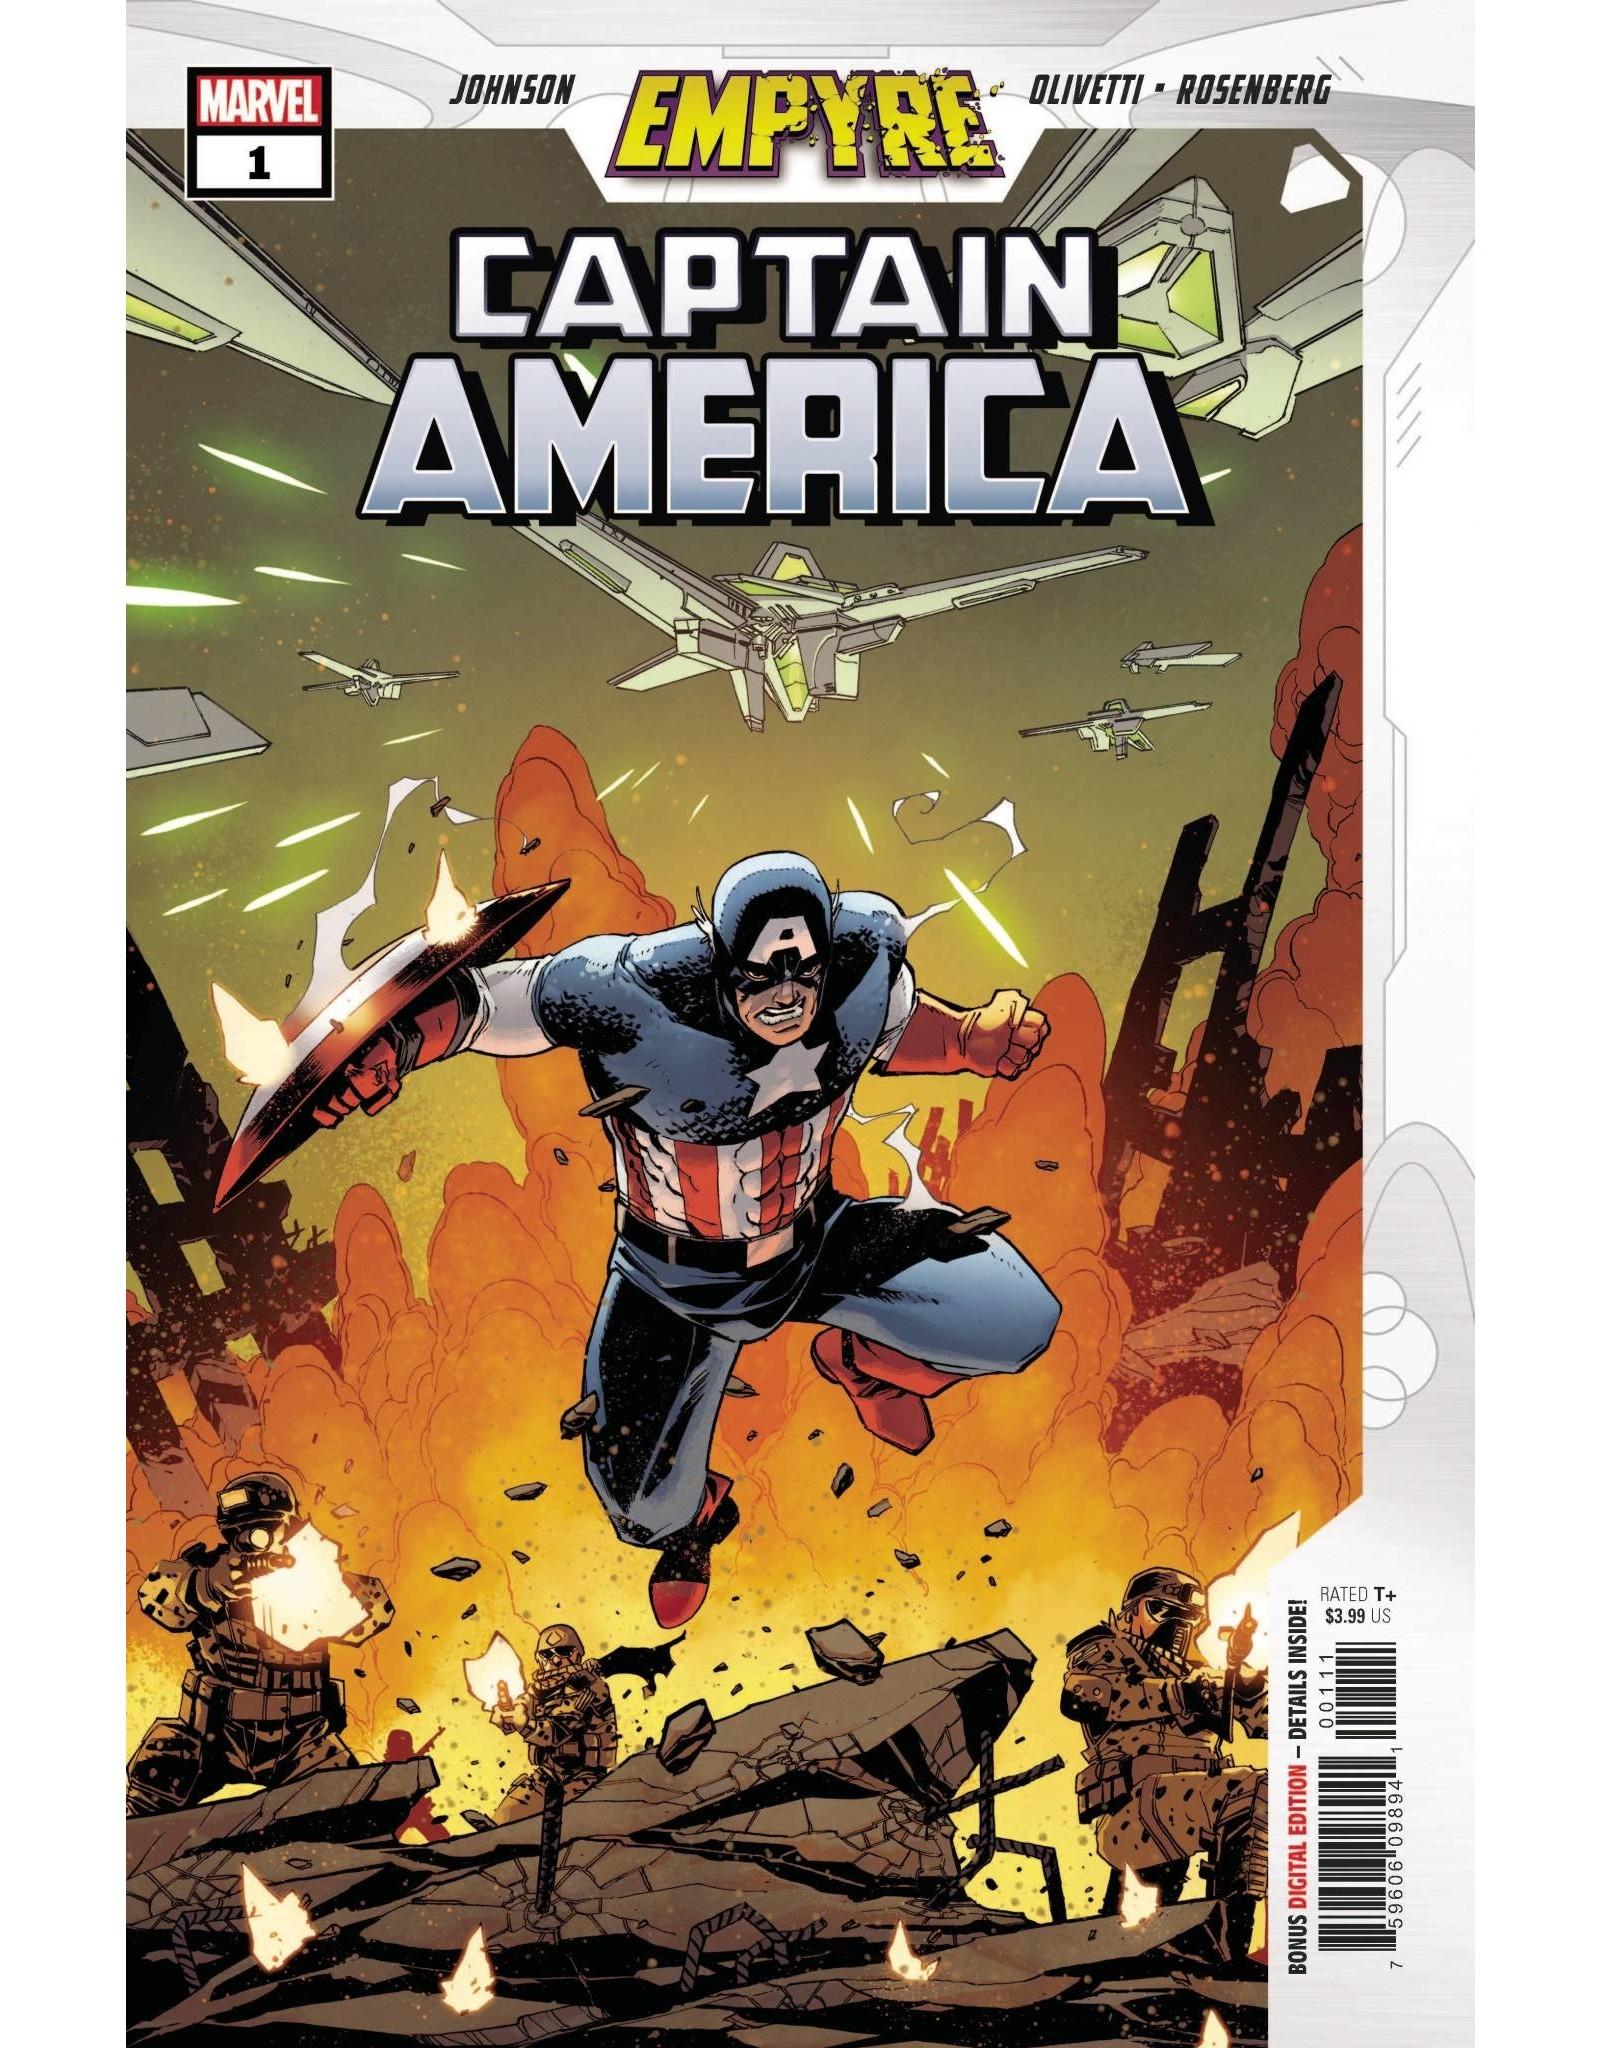 MARVEL COMICS EMPYRE CAPTAIN AMERICA #1 (OF 3)